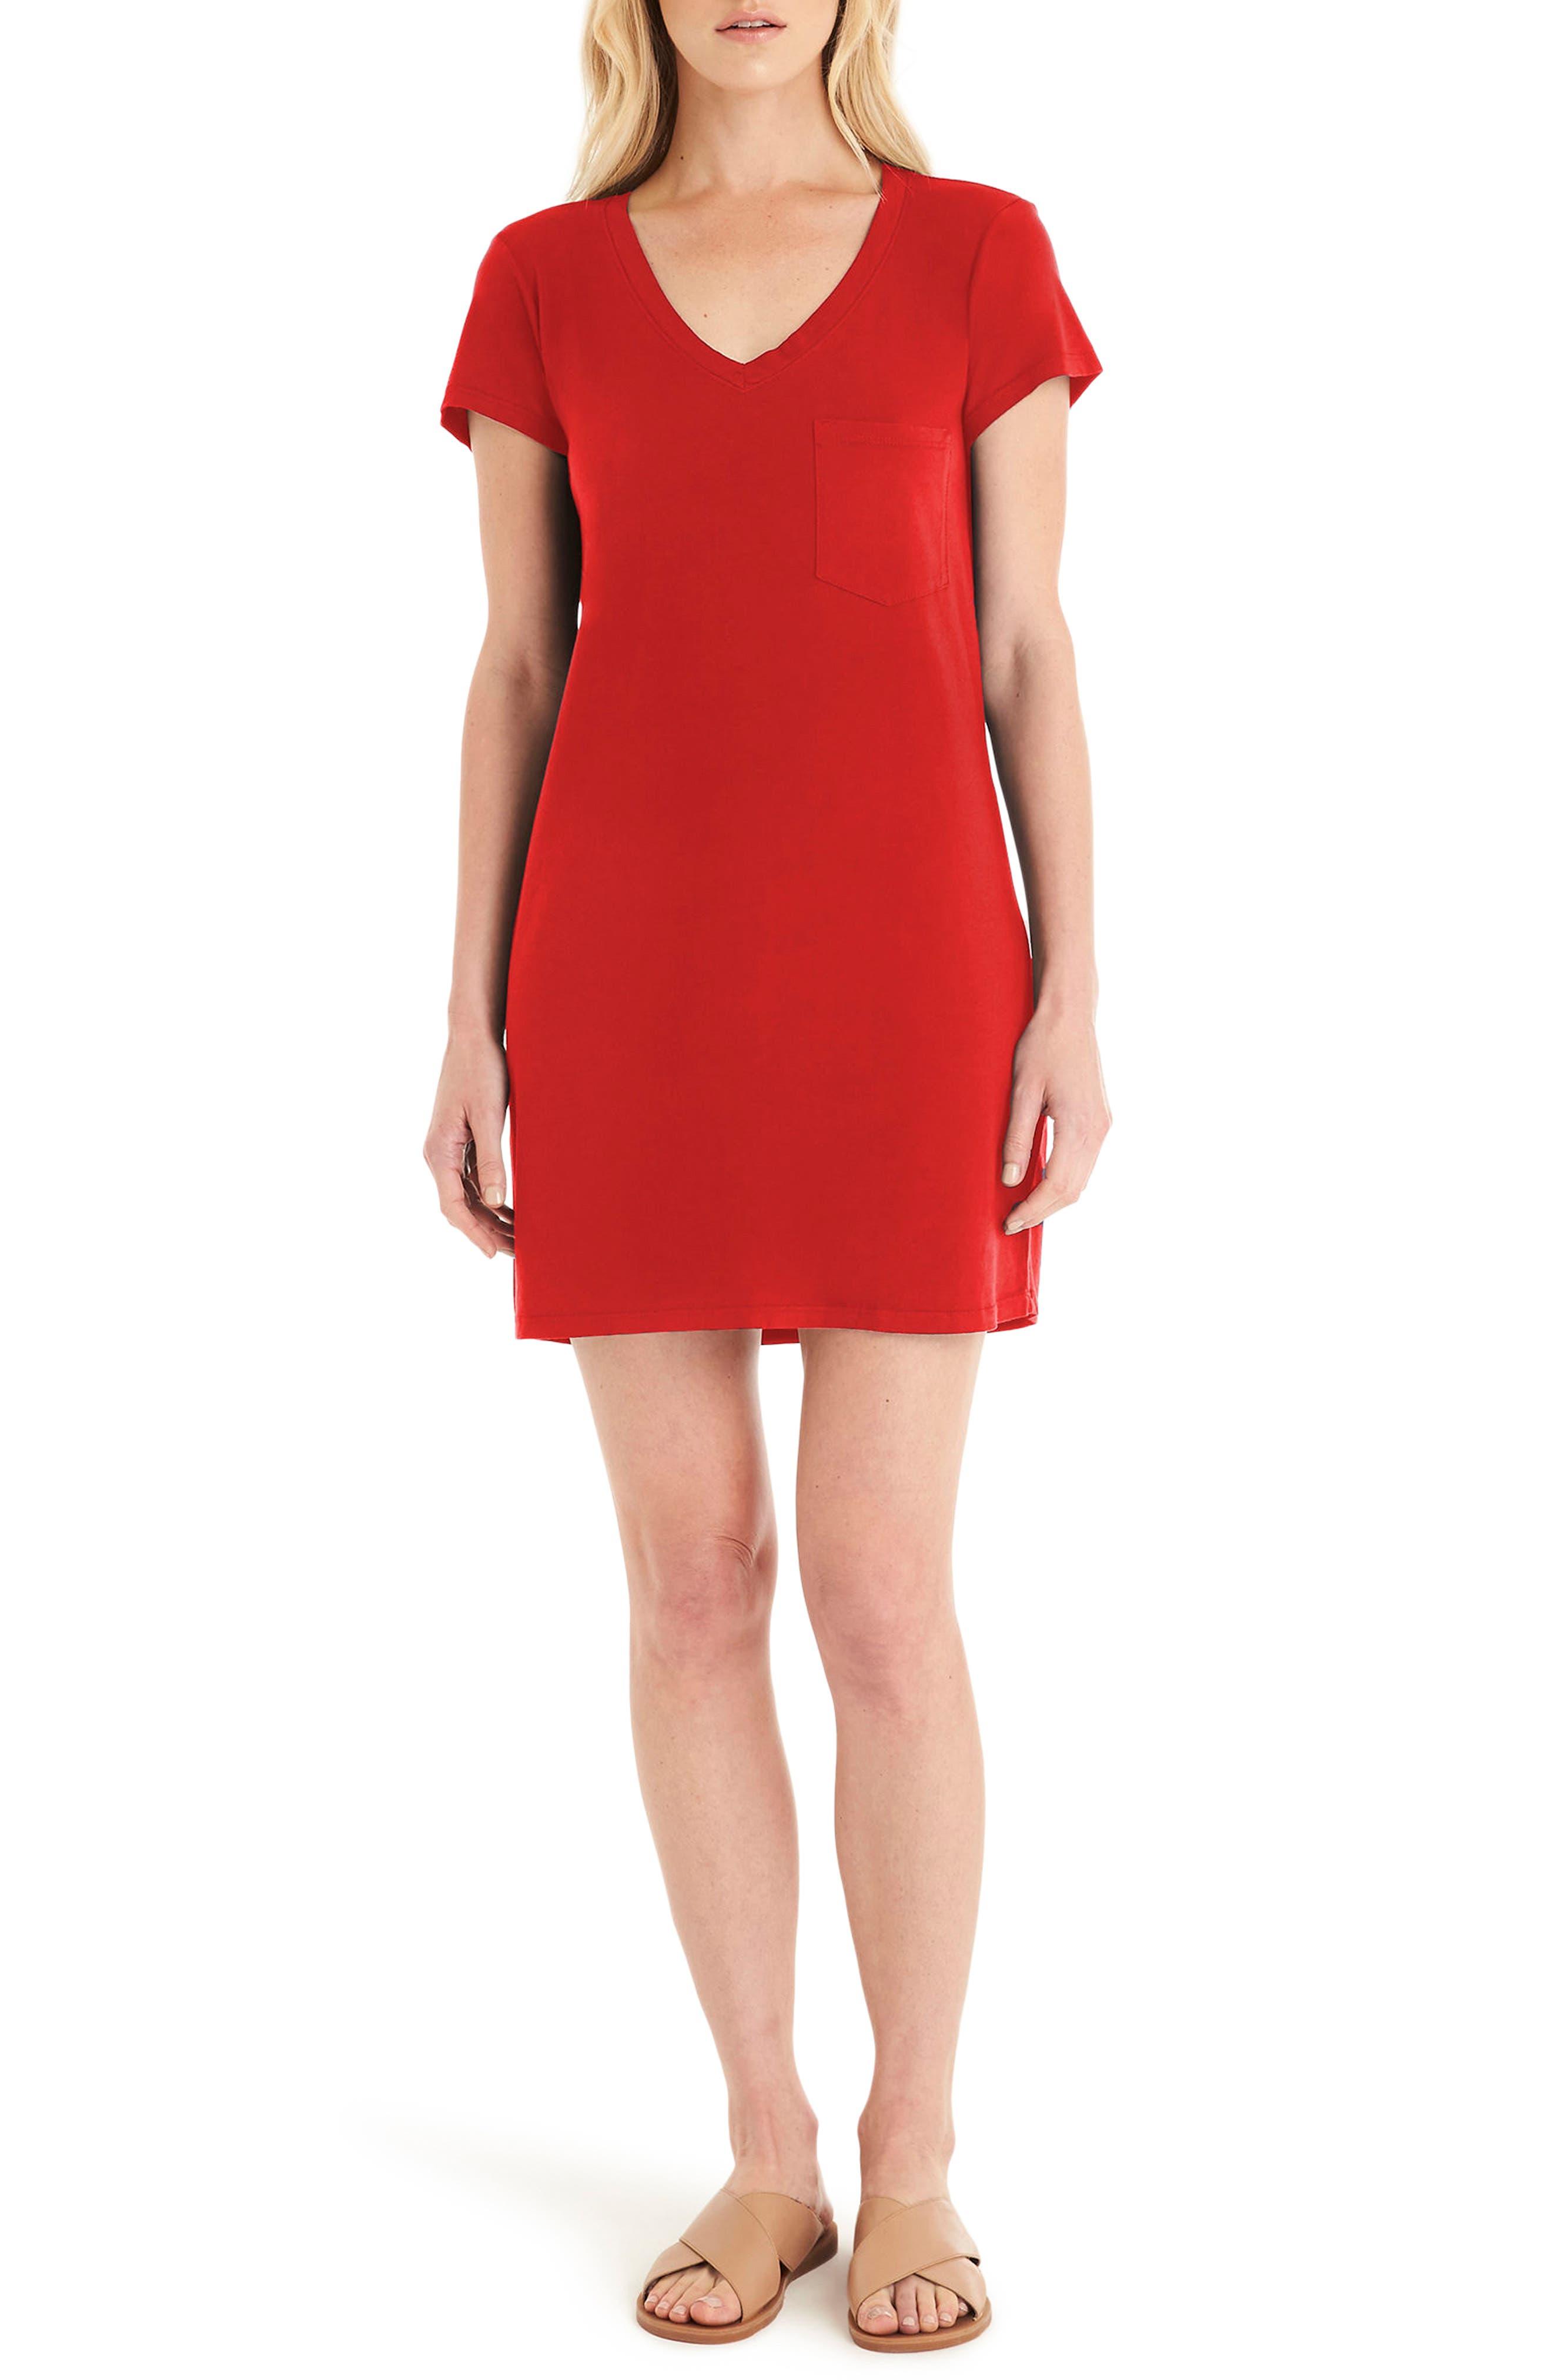 Fresh Women's Shirtdresses & T-Shirt Dresses | Nordstrom RV12